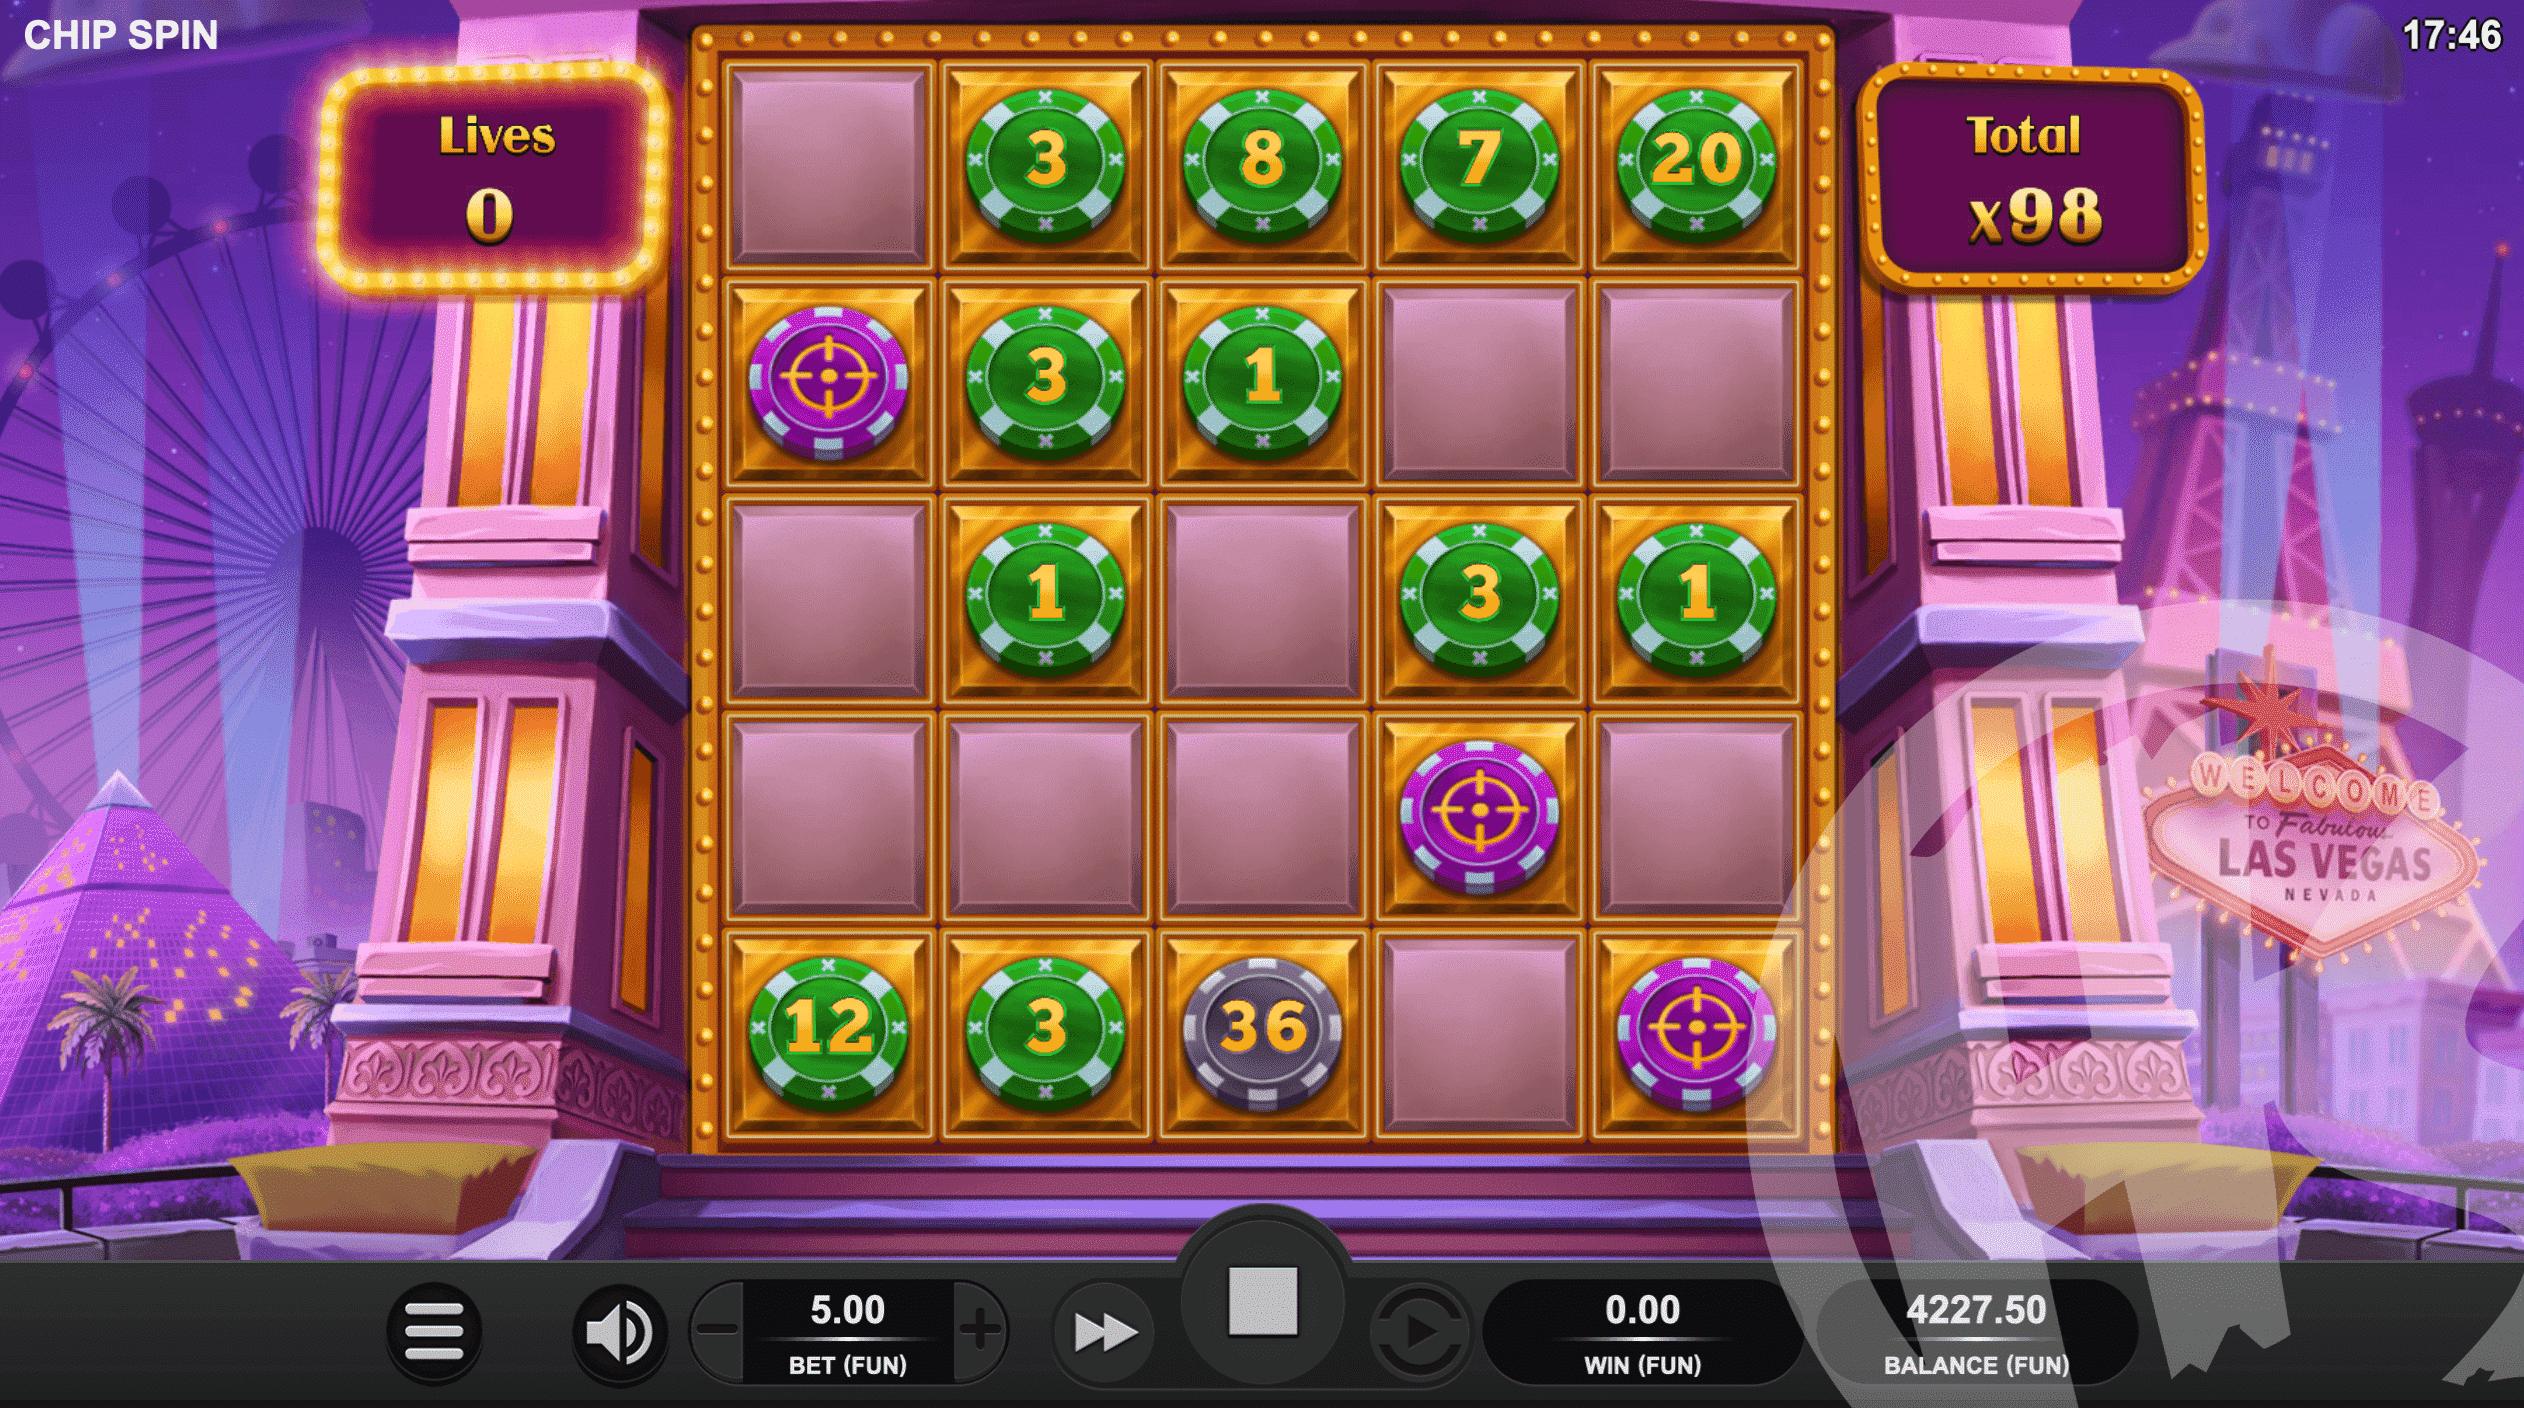 Chip Spin Bonus Game